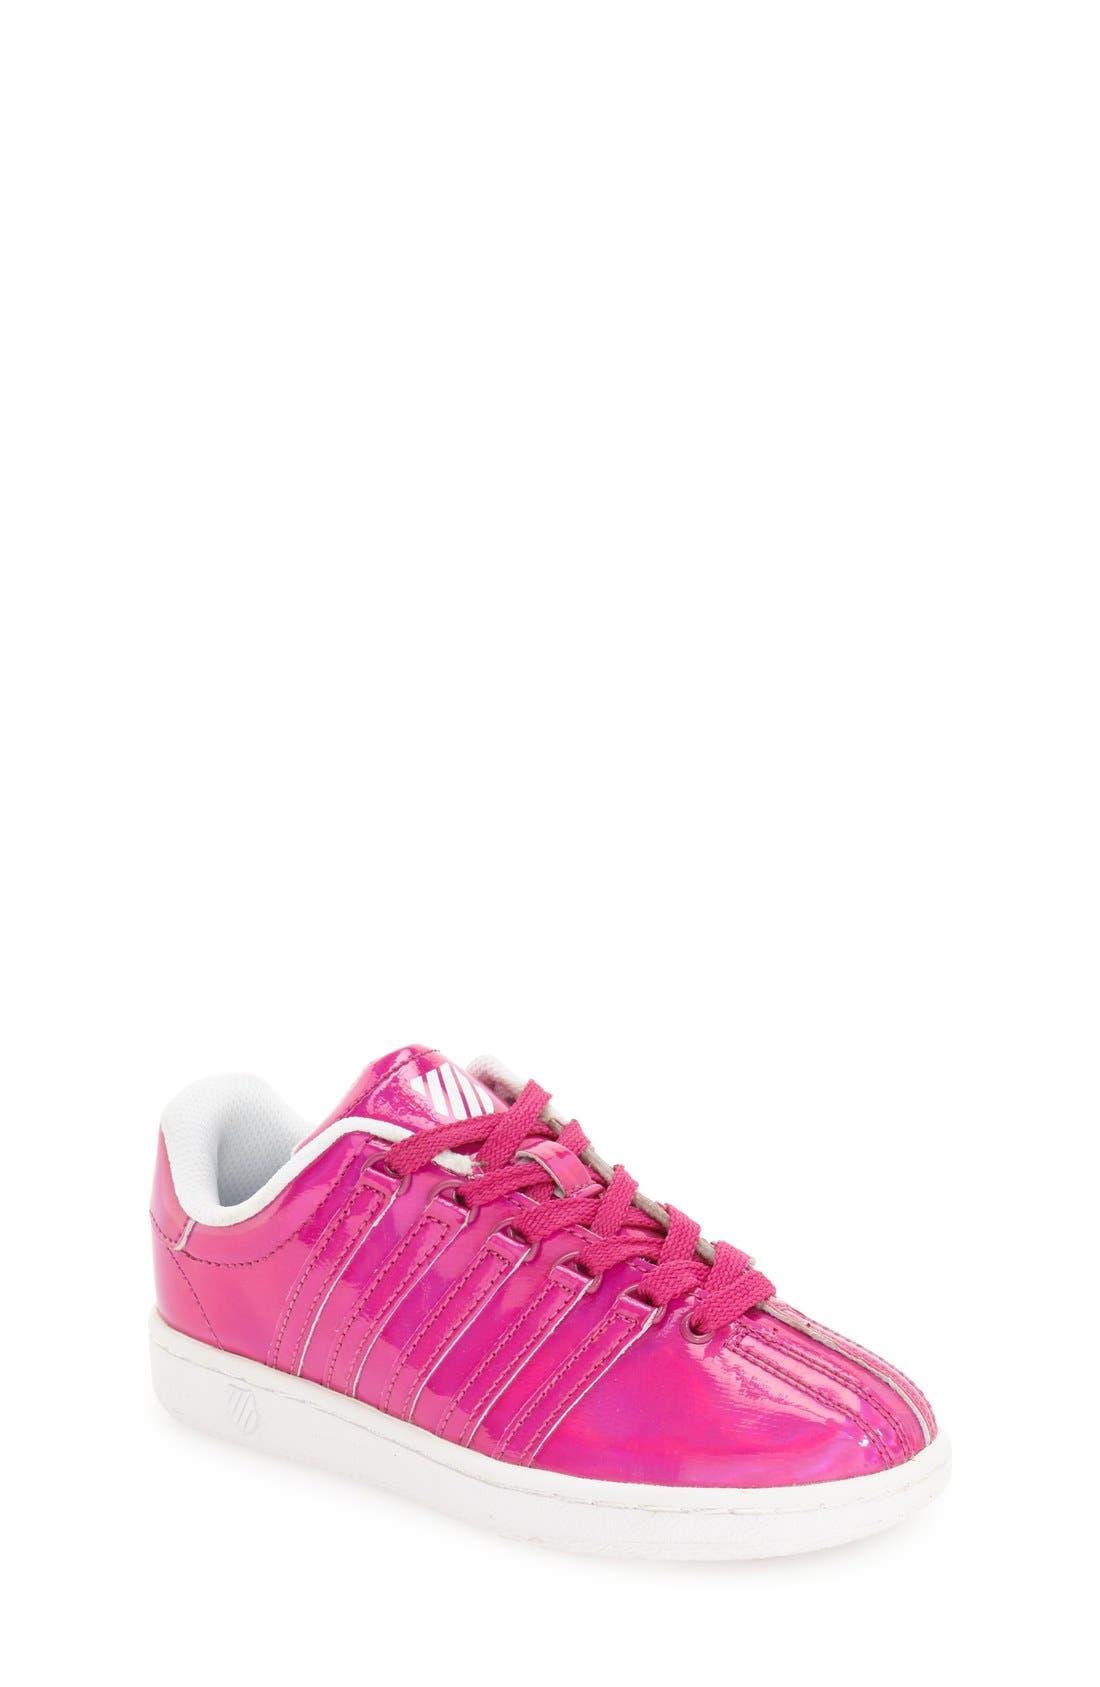 'Classic - Shine On' Sneaker,                             Main thumbnail 1, color,                             Pink/ White